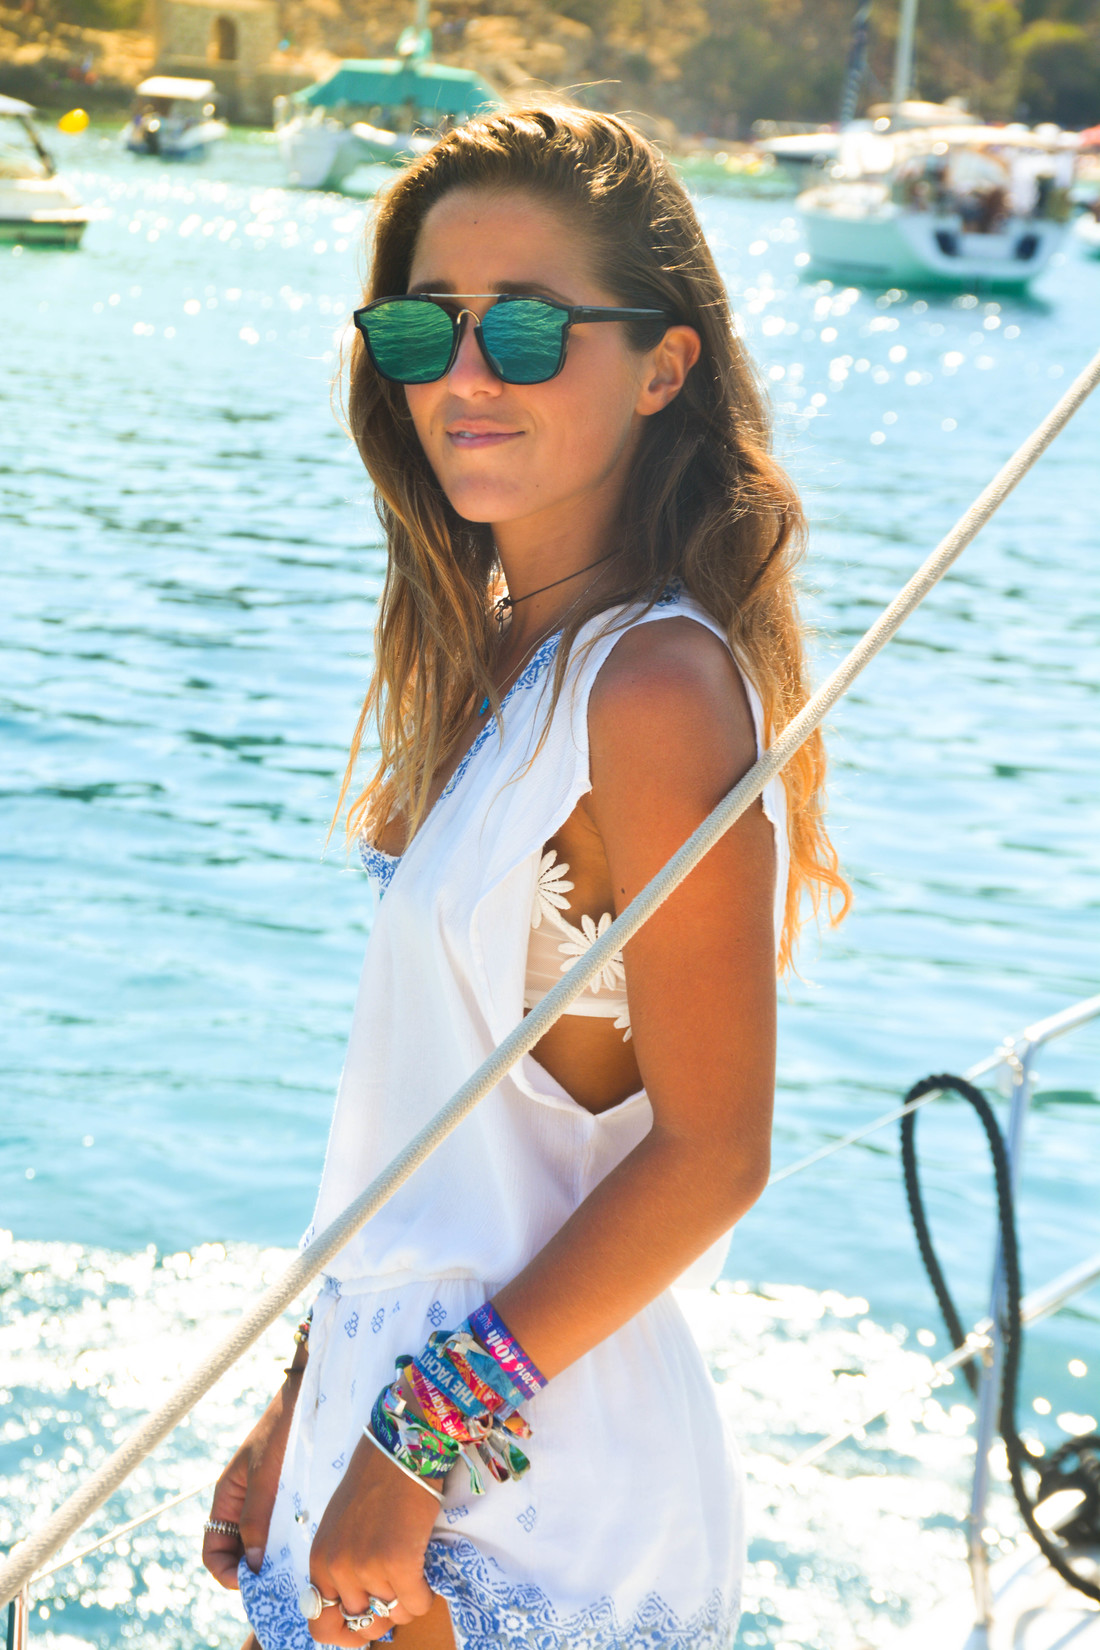 mallorca_sailing_perrirothenberg-6675-3.jpg